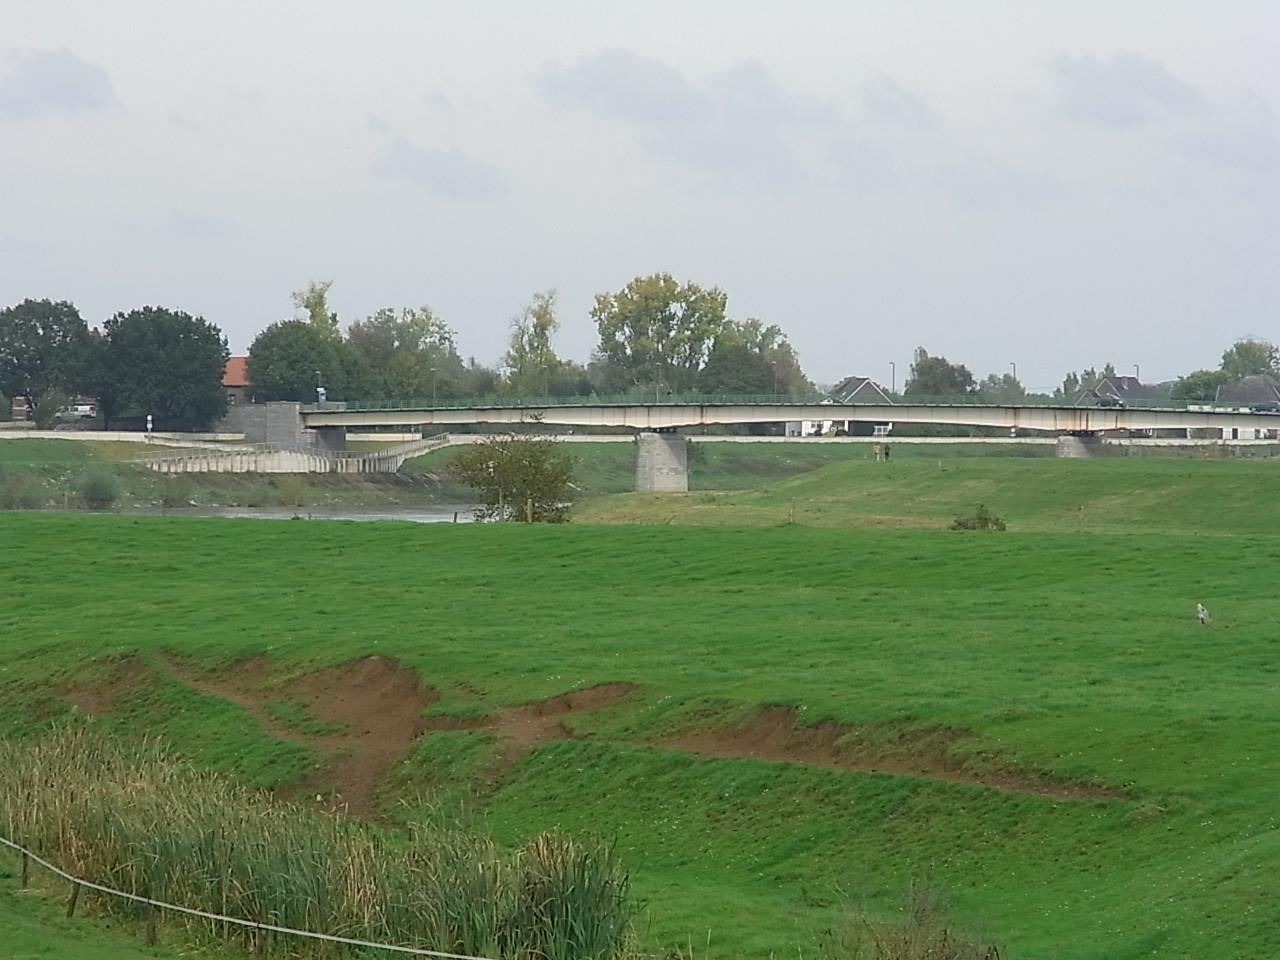 Die Brücke nach Maaseik